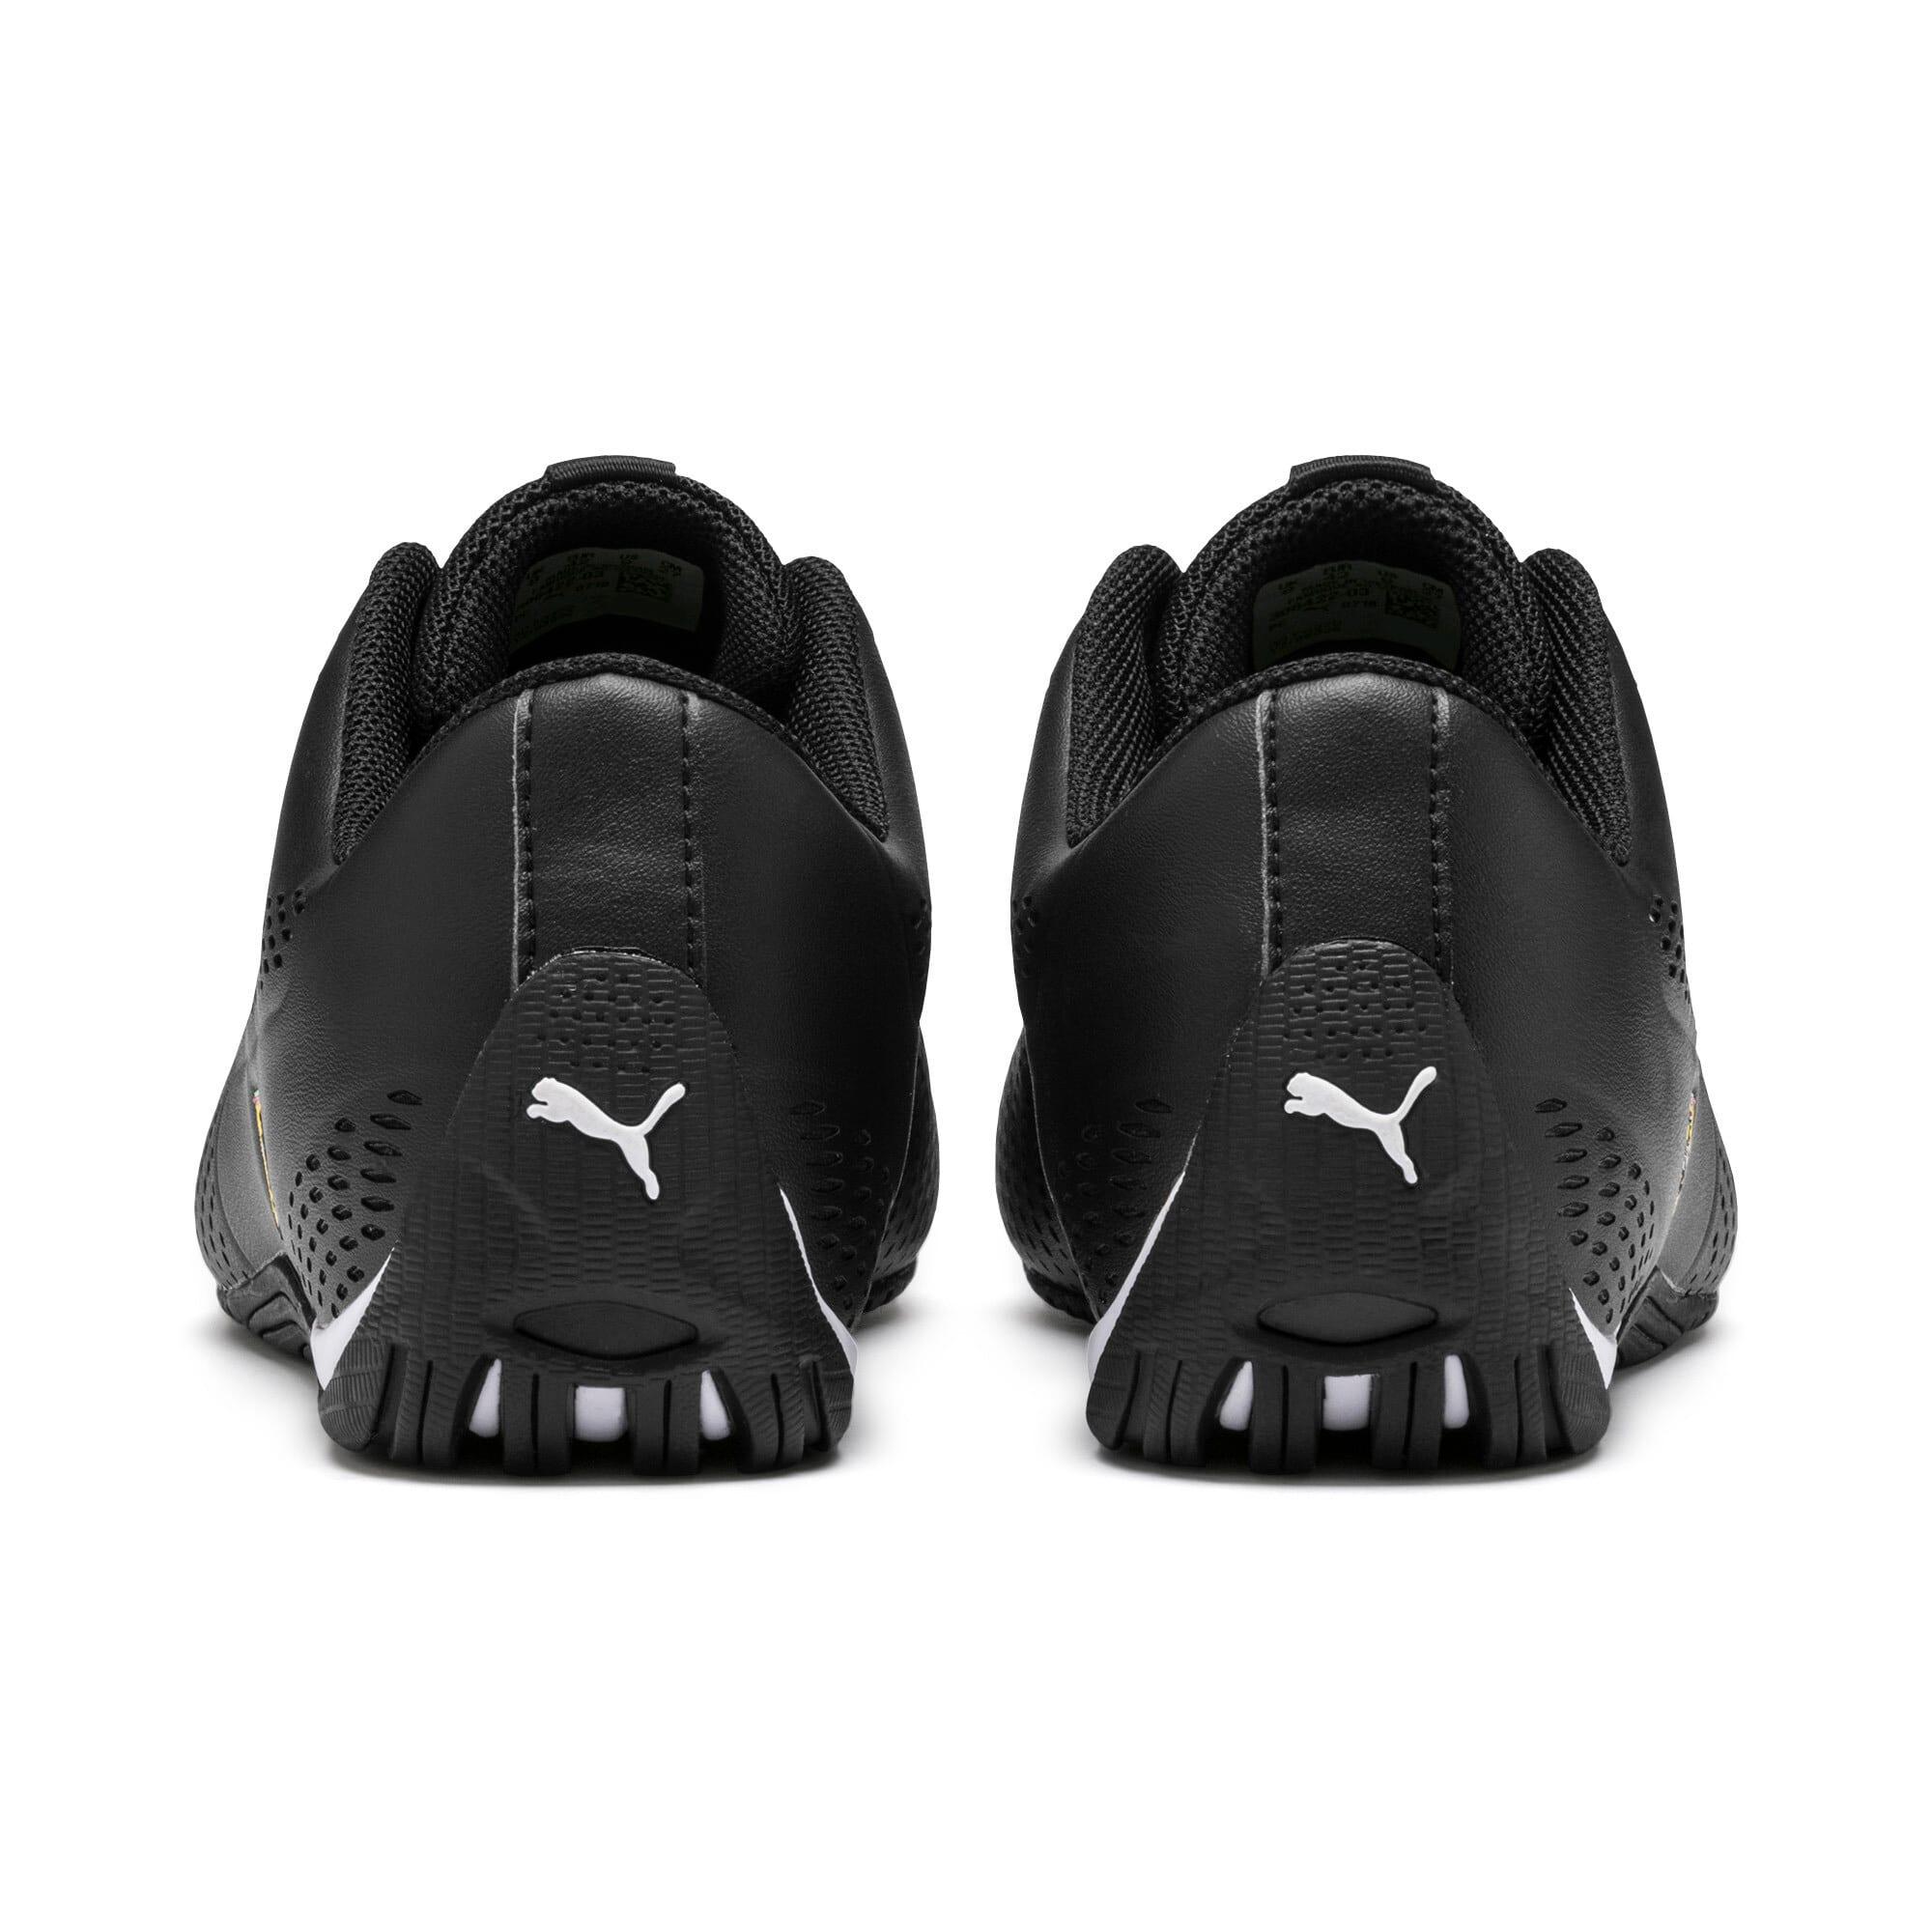 Thumbnail 4 of Scuderia Ferrari Drift Cat 5 Ultra II Shoes, Puma Black-Puma White, medium